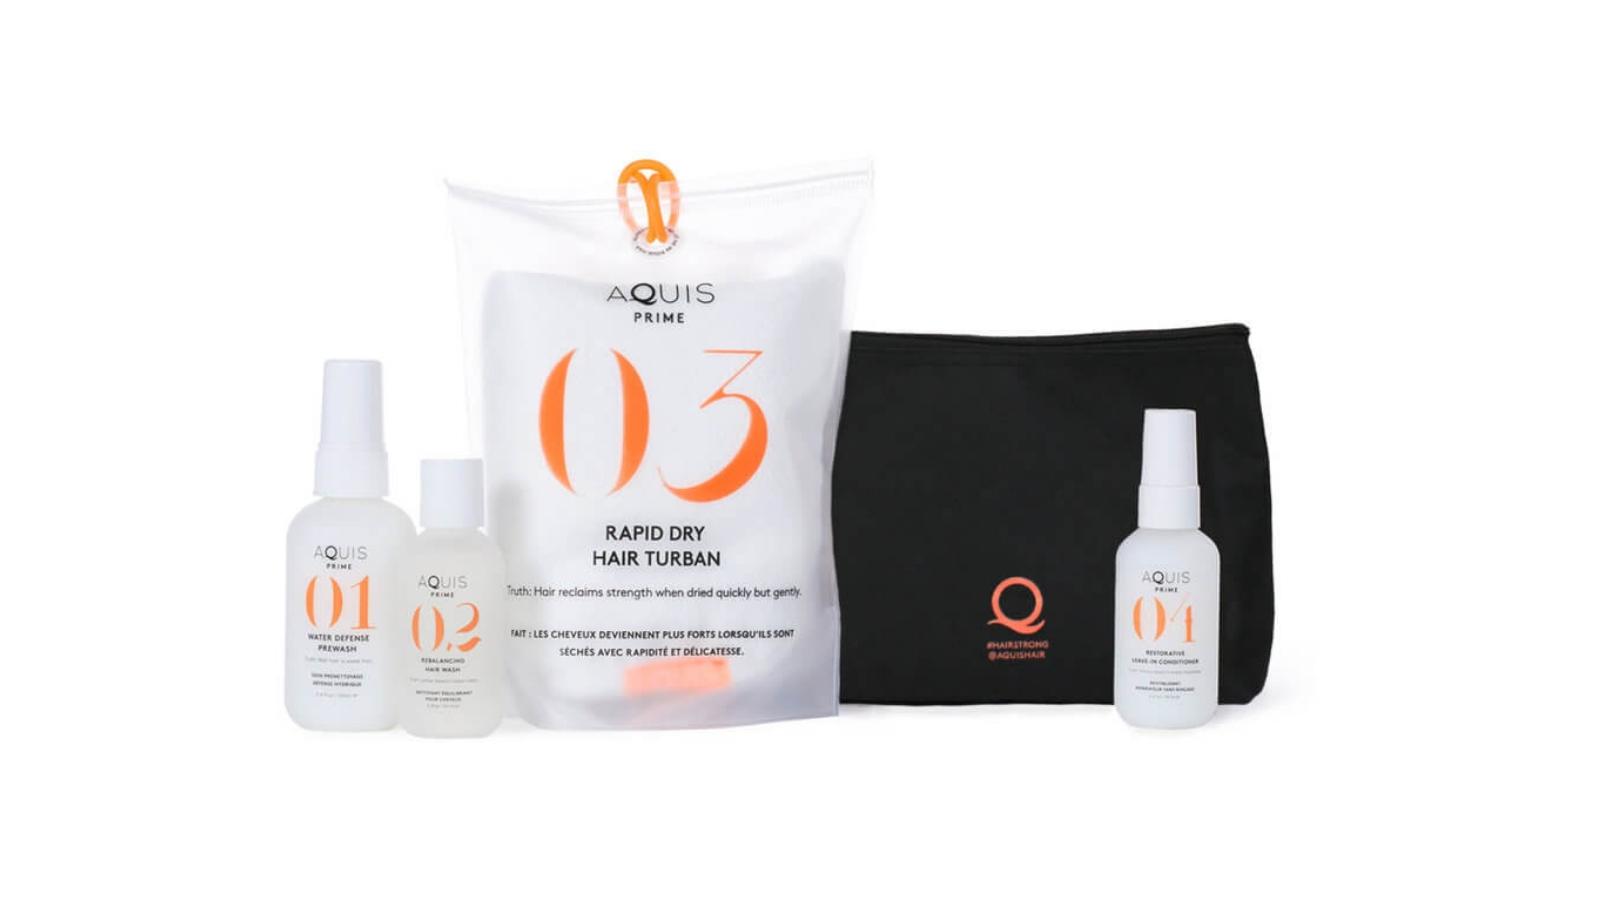 Aquis Prime Starter Kit $66